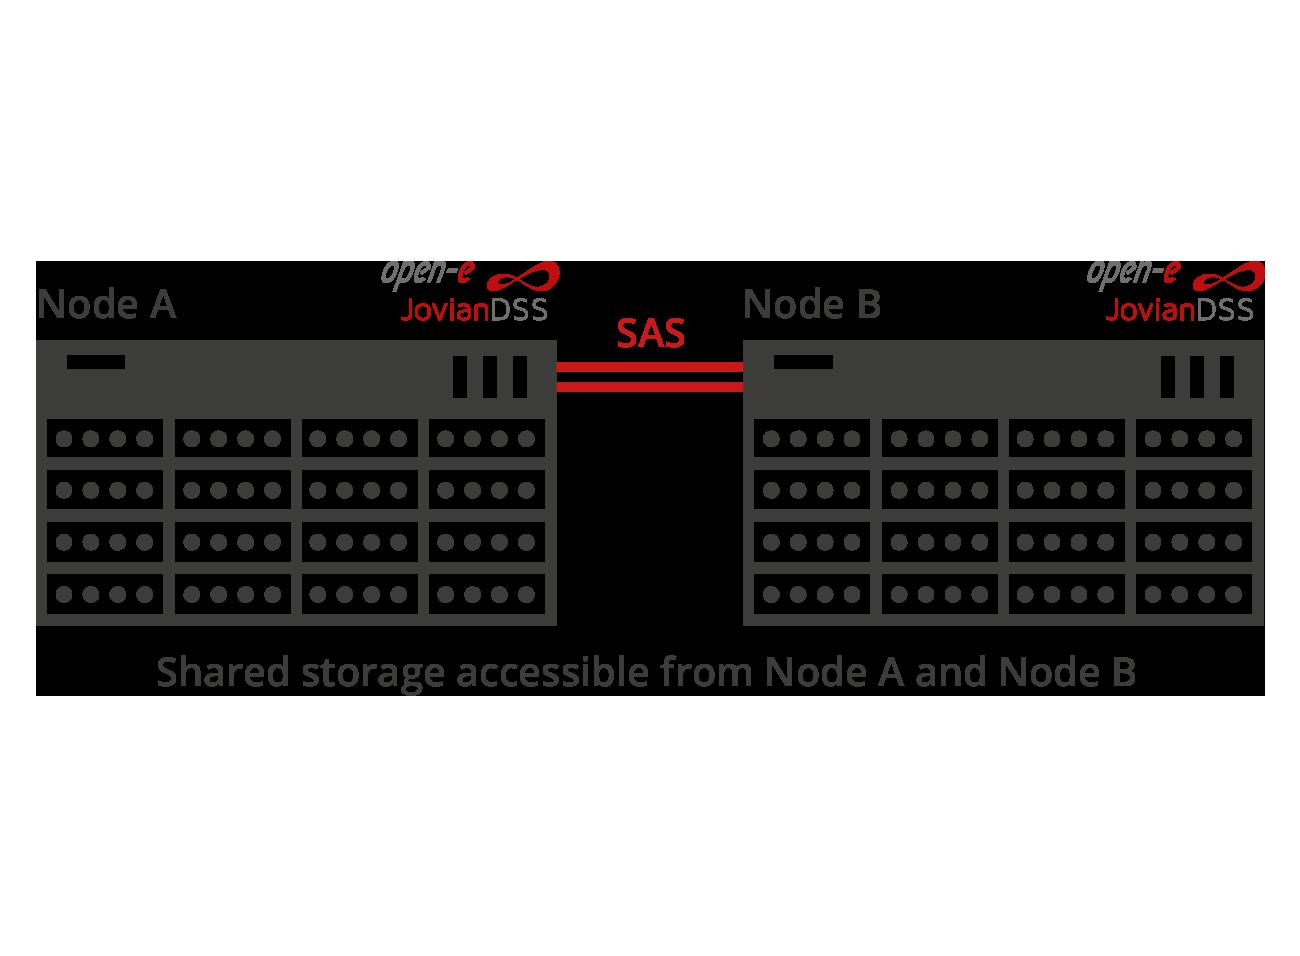 Standard High Availability dual internal storage